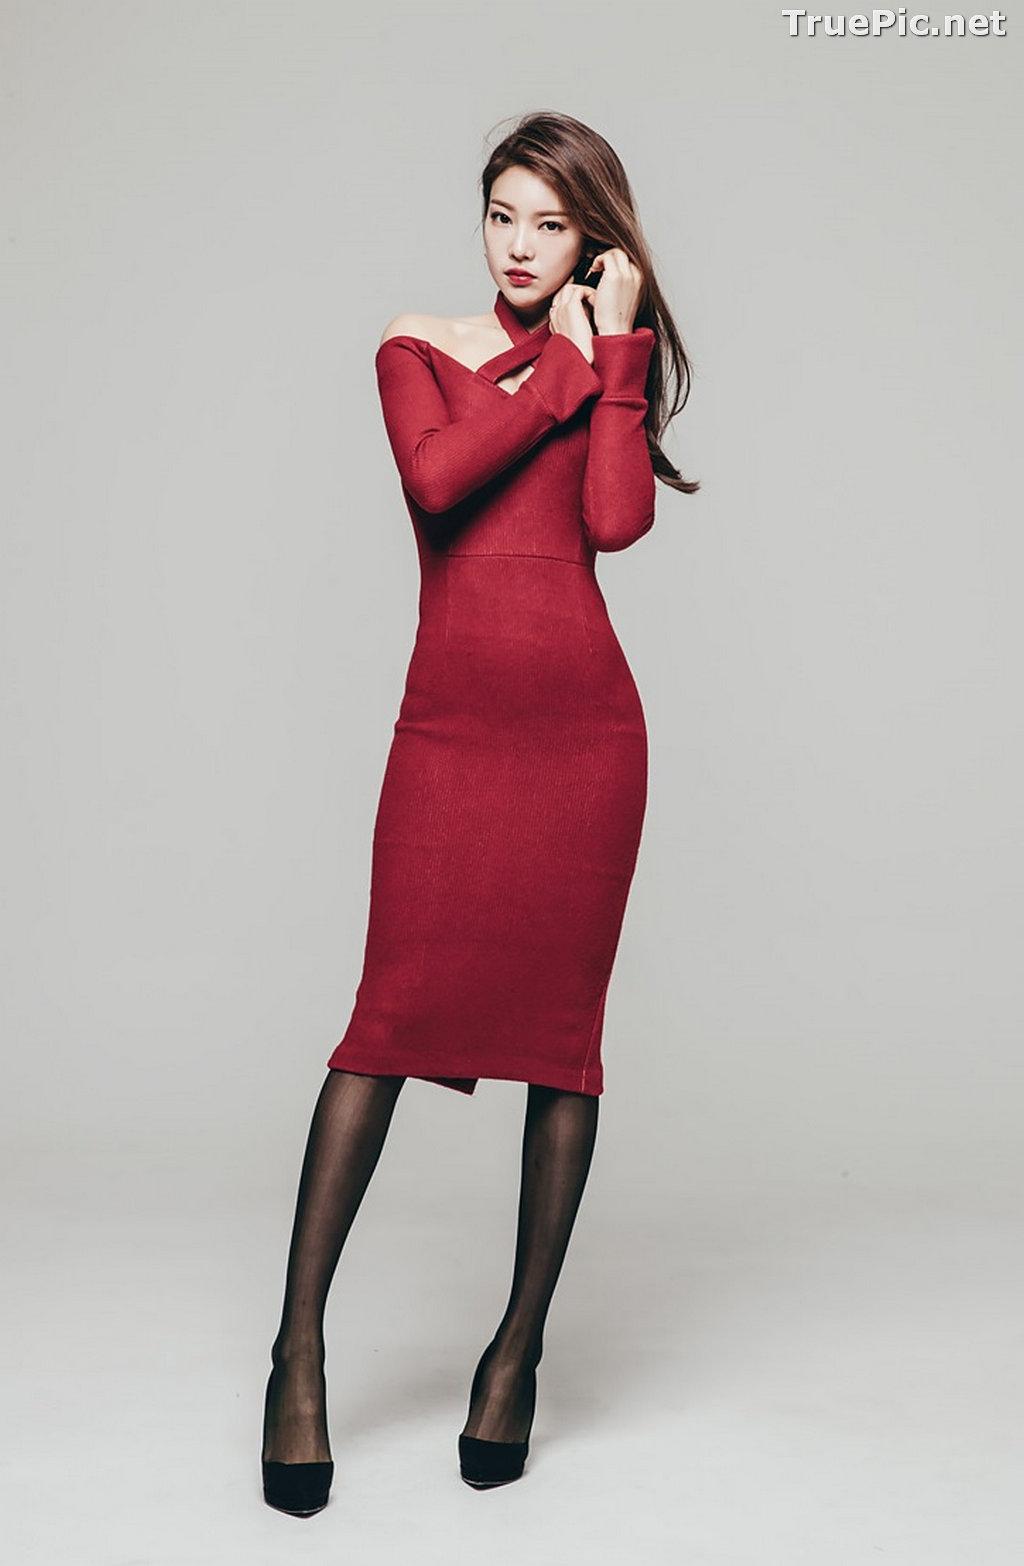 Image Korean Beautiful Model – Park Jung Yoon – Fashion Photography #11 - TruePic.net - Picture-24